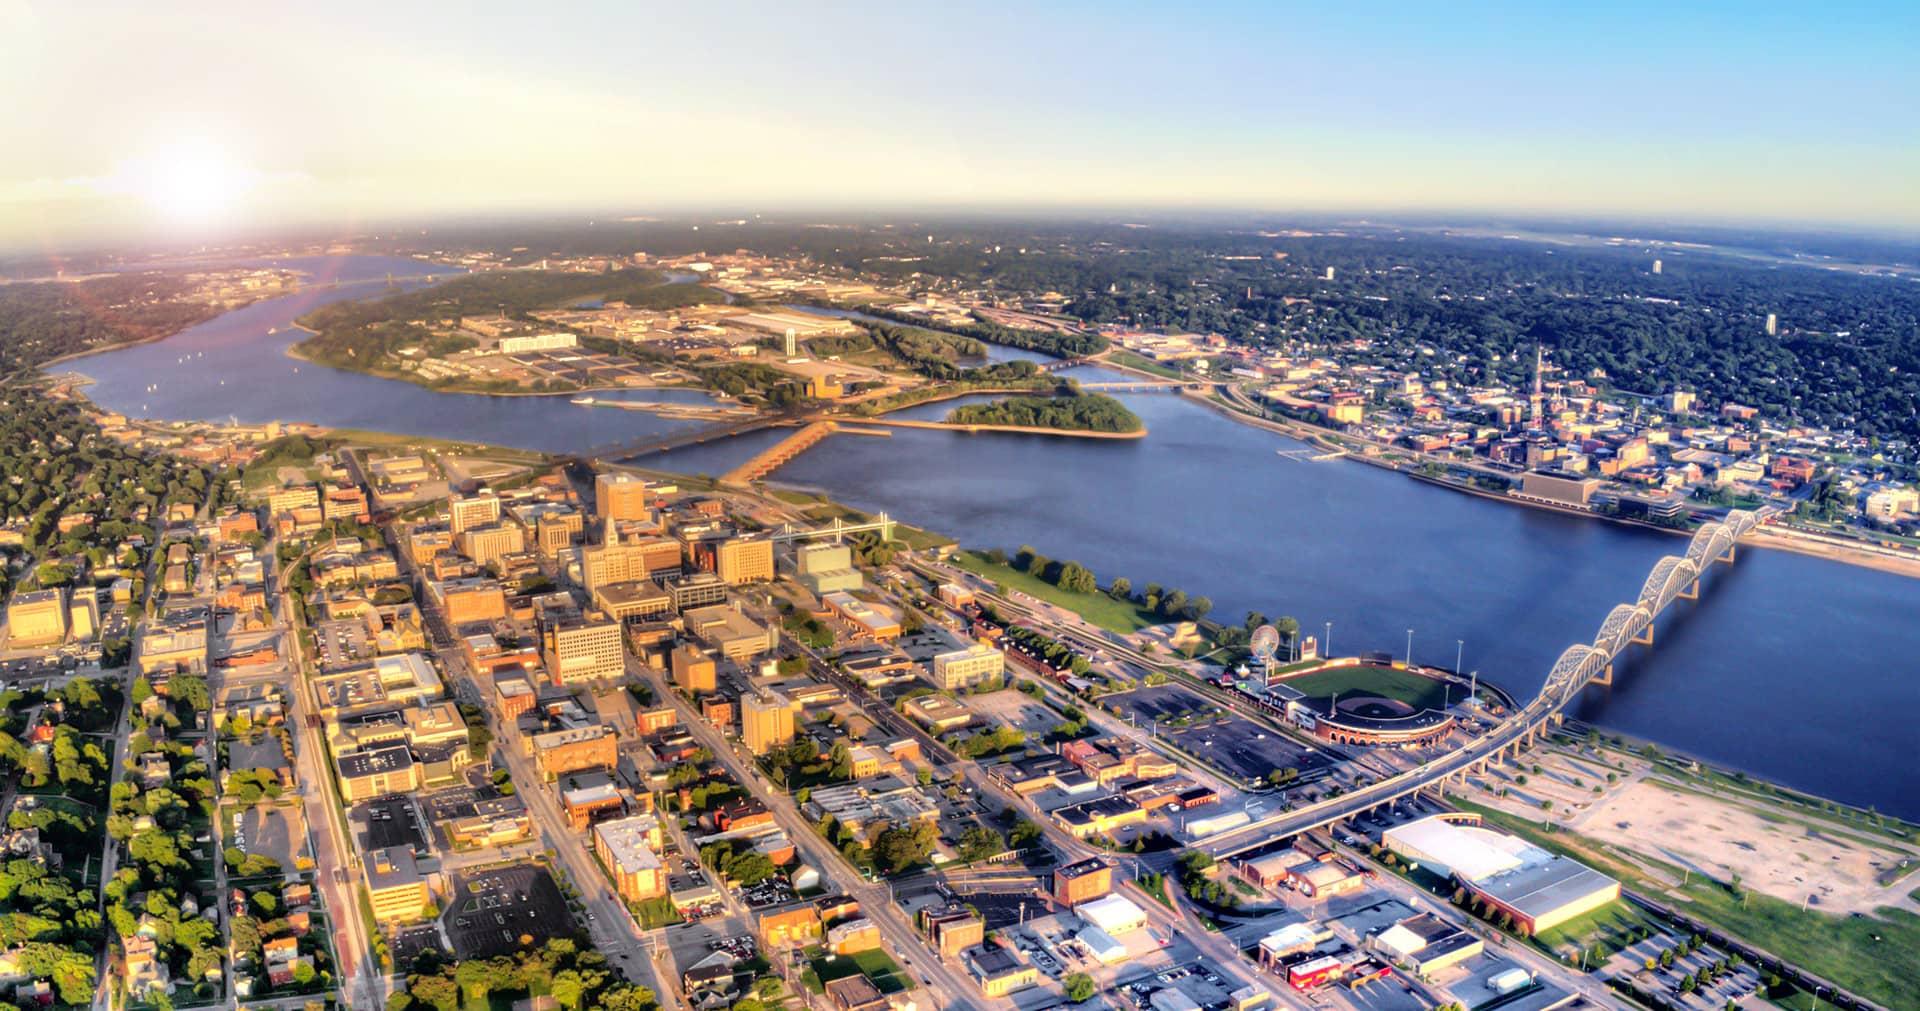 Image of Moline, IL